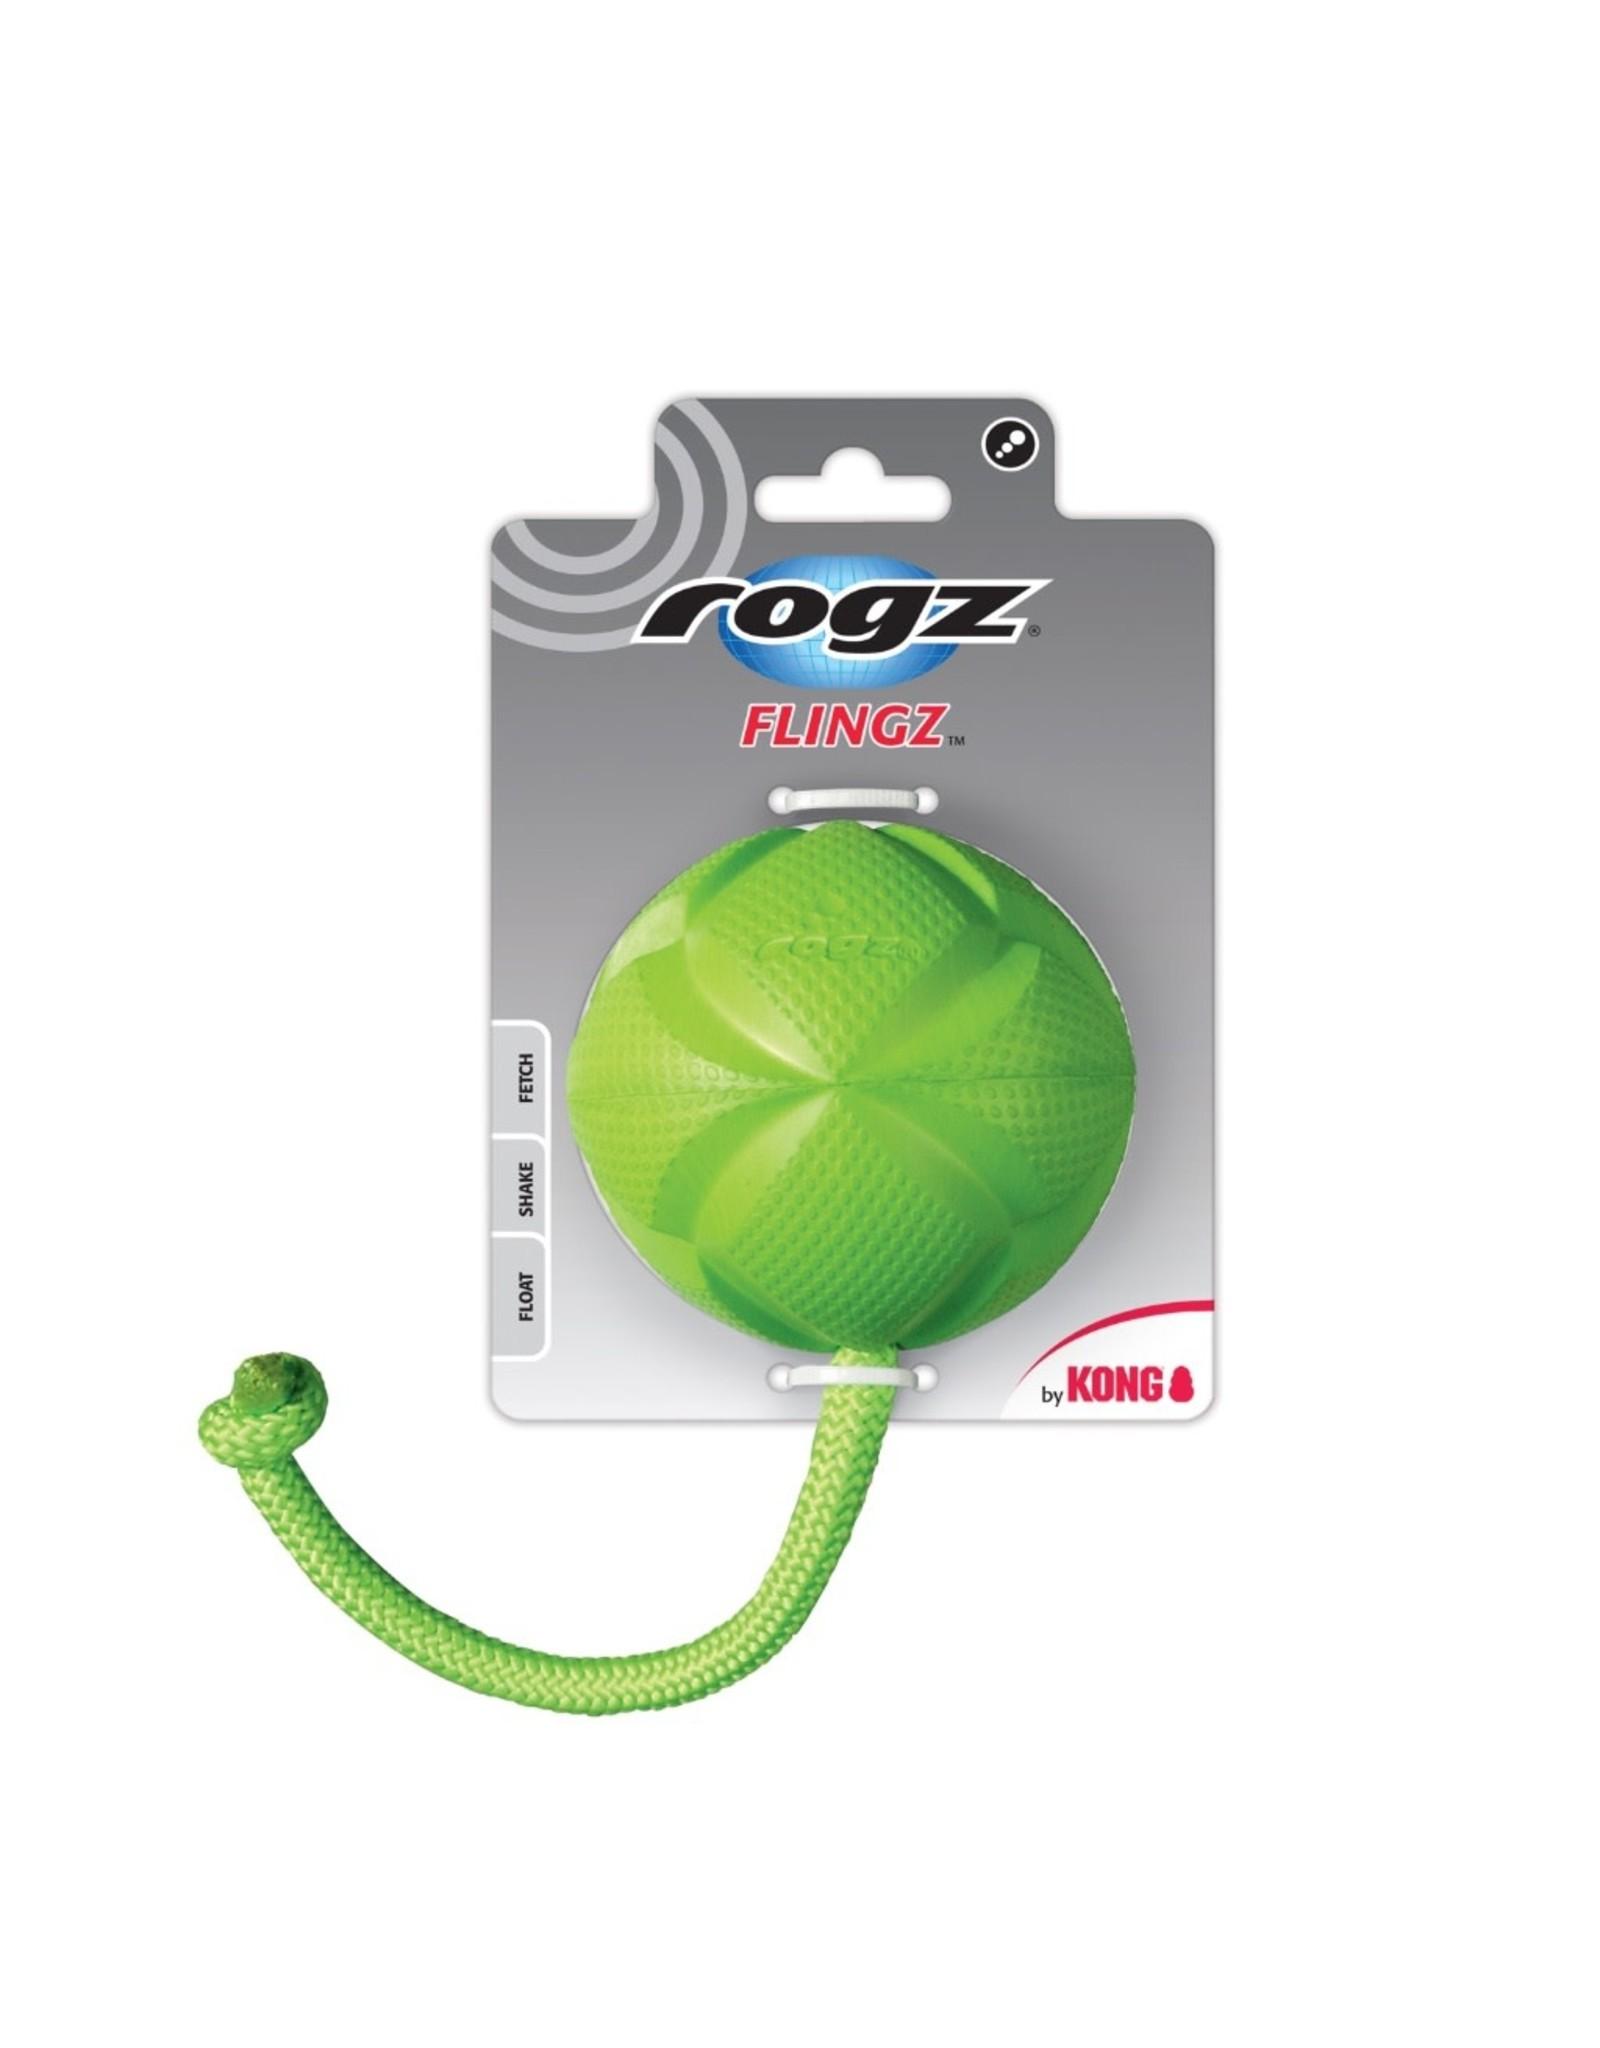 Rogz by Kong Rogz Flingz Ball with Rope LG